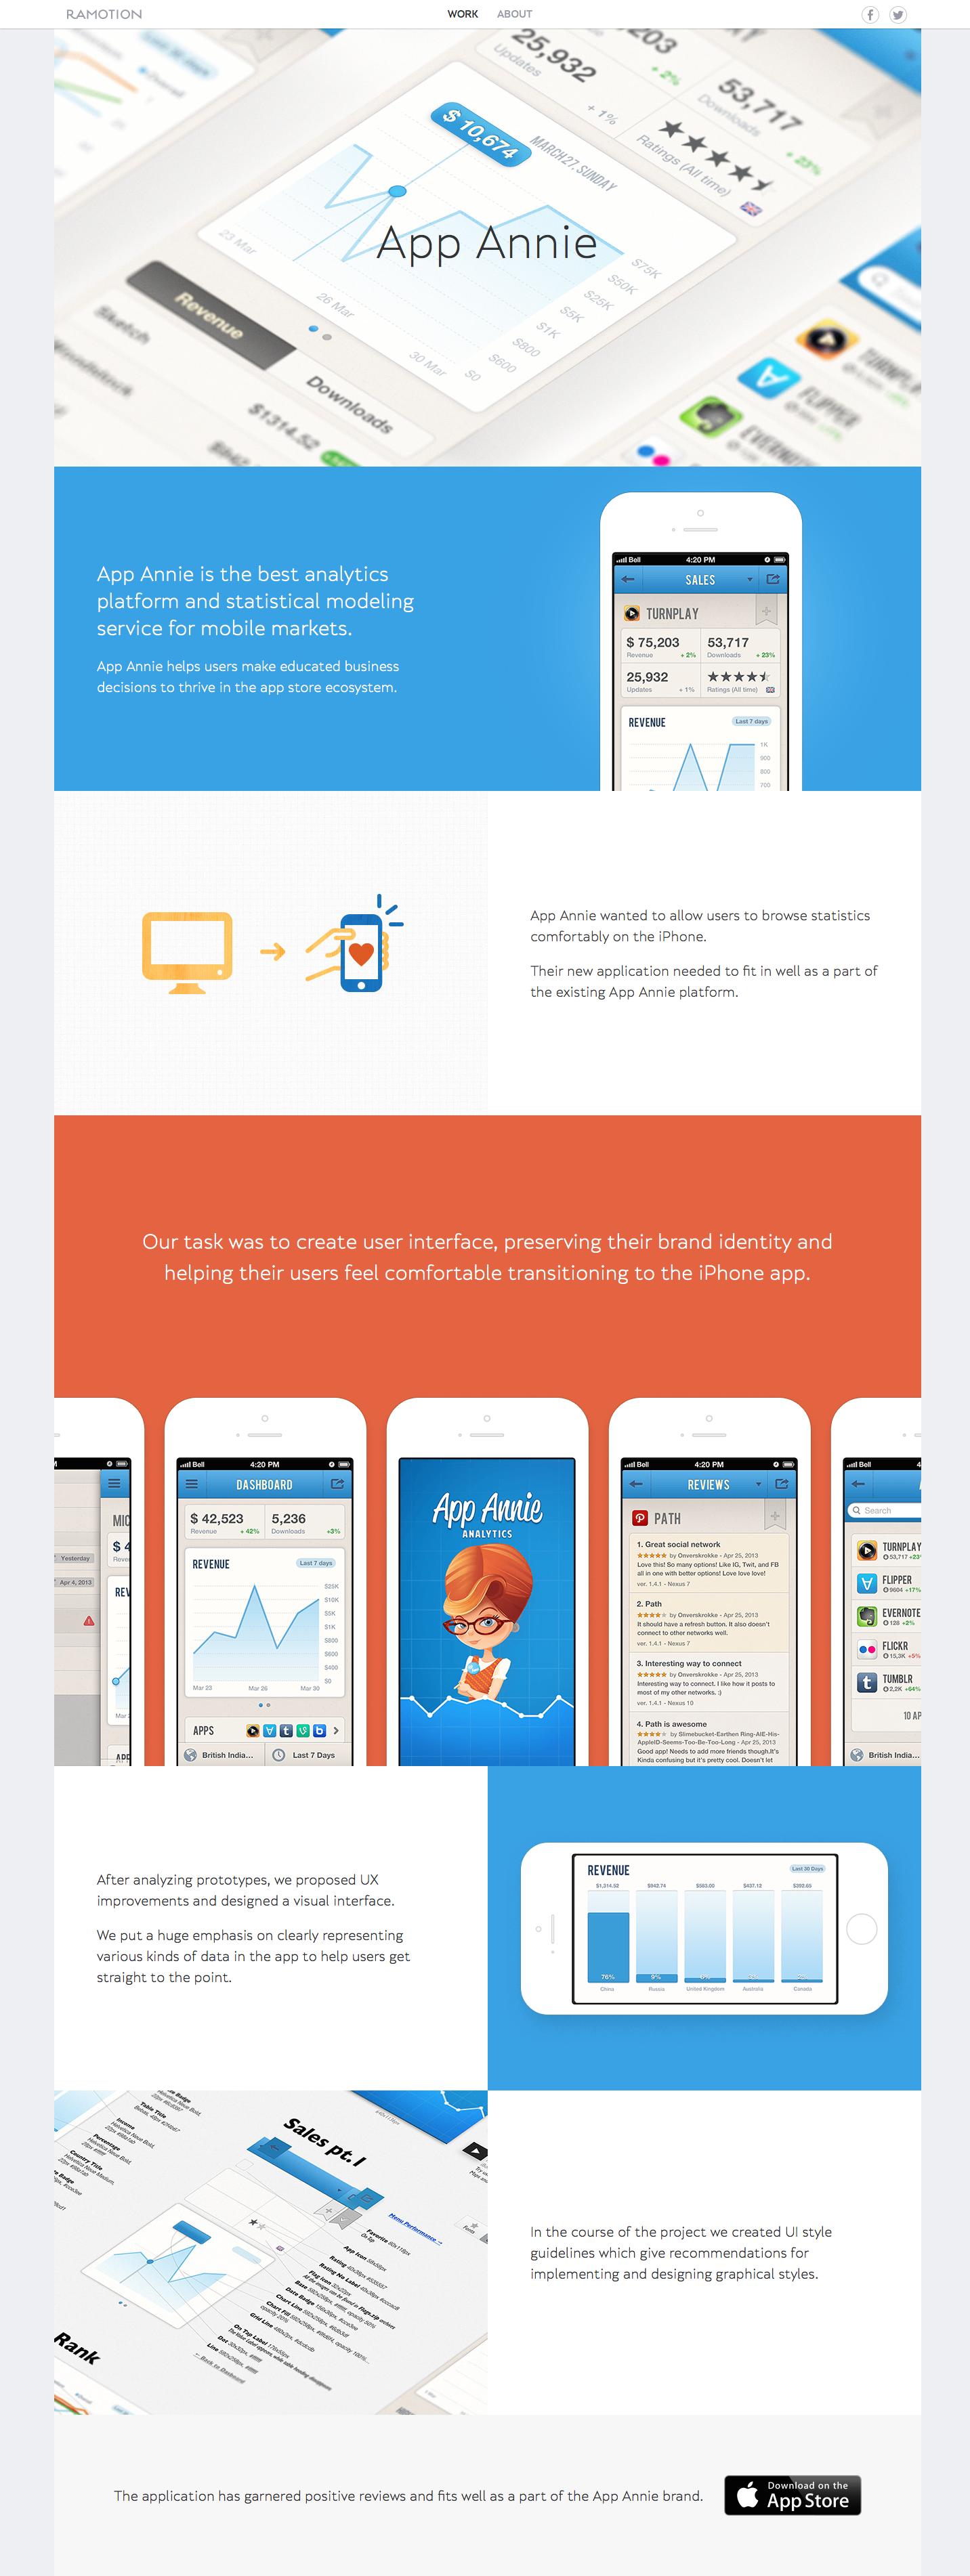 Pin By Zagma Smart On Ued Web Design Tools Web Design Iphone App Design